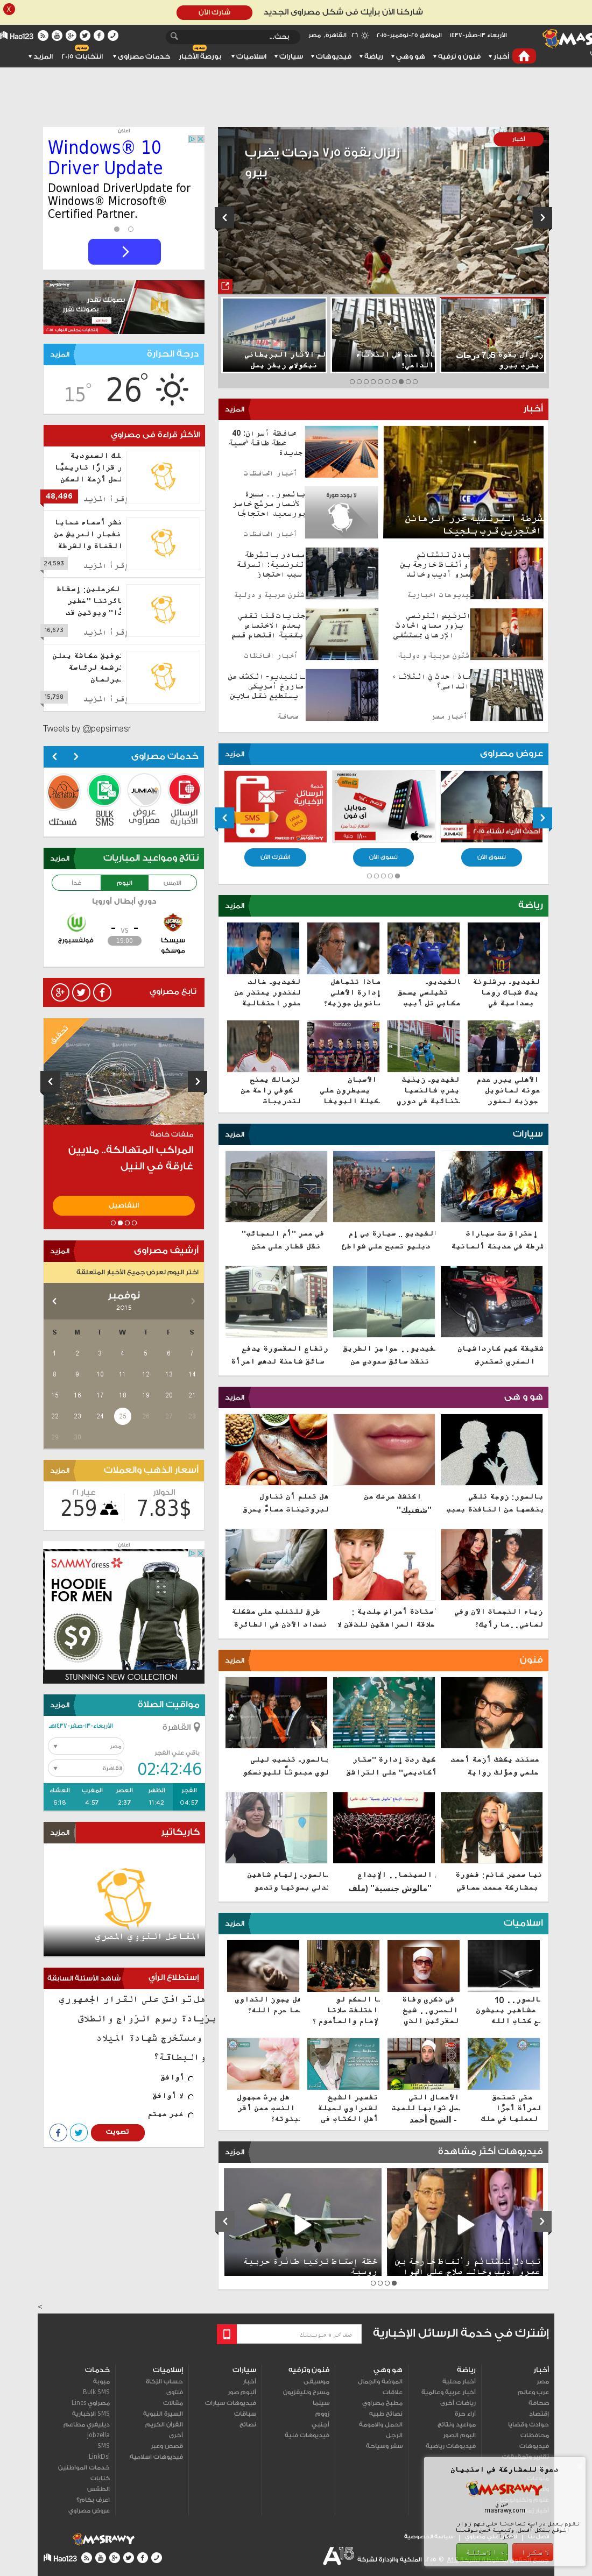 Masrawy at Wednesday Nov. 25, 2015, 2:13 a.m. UTC